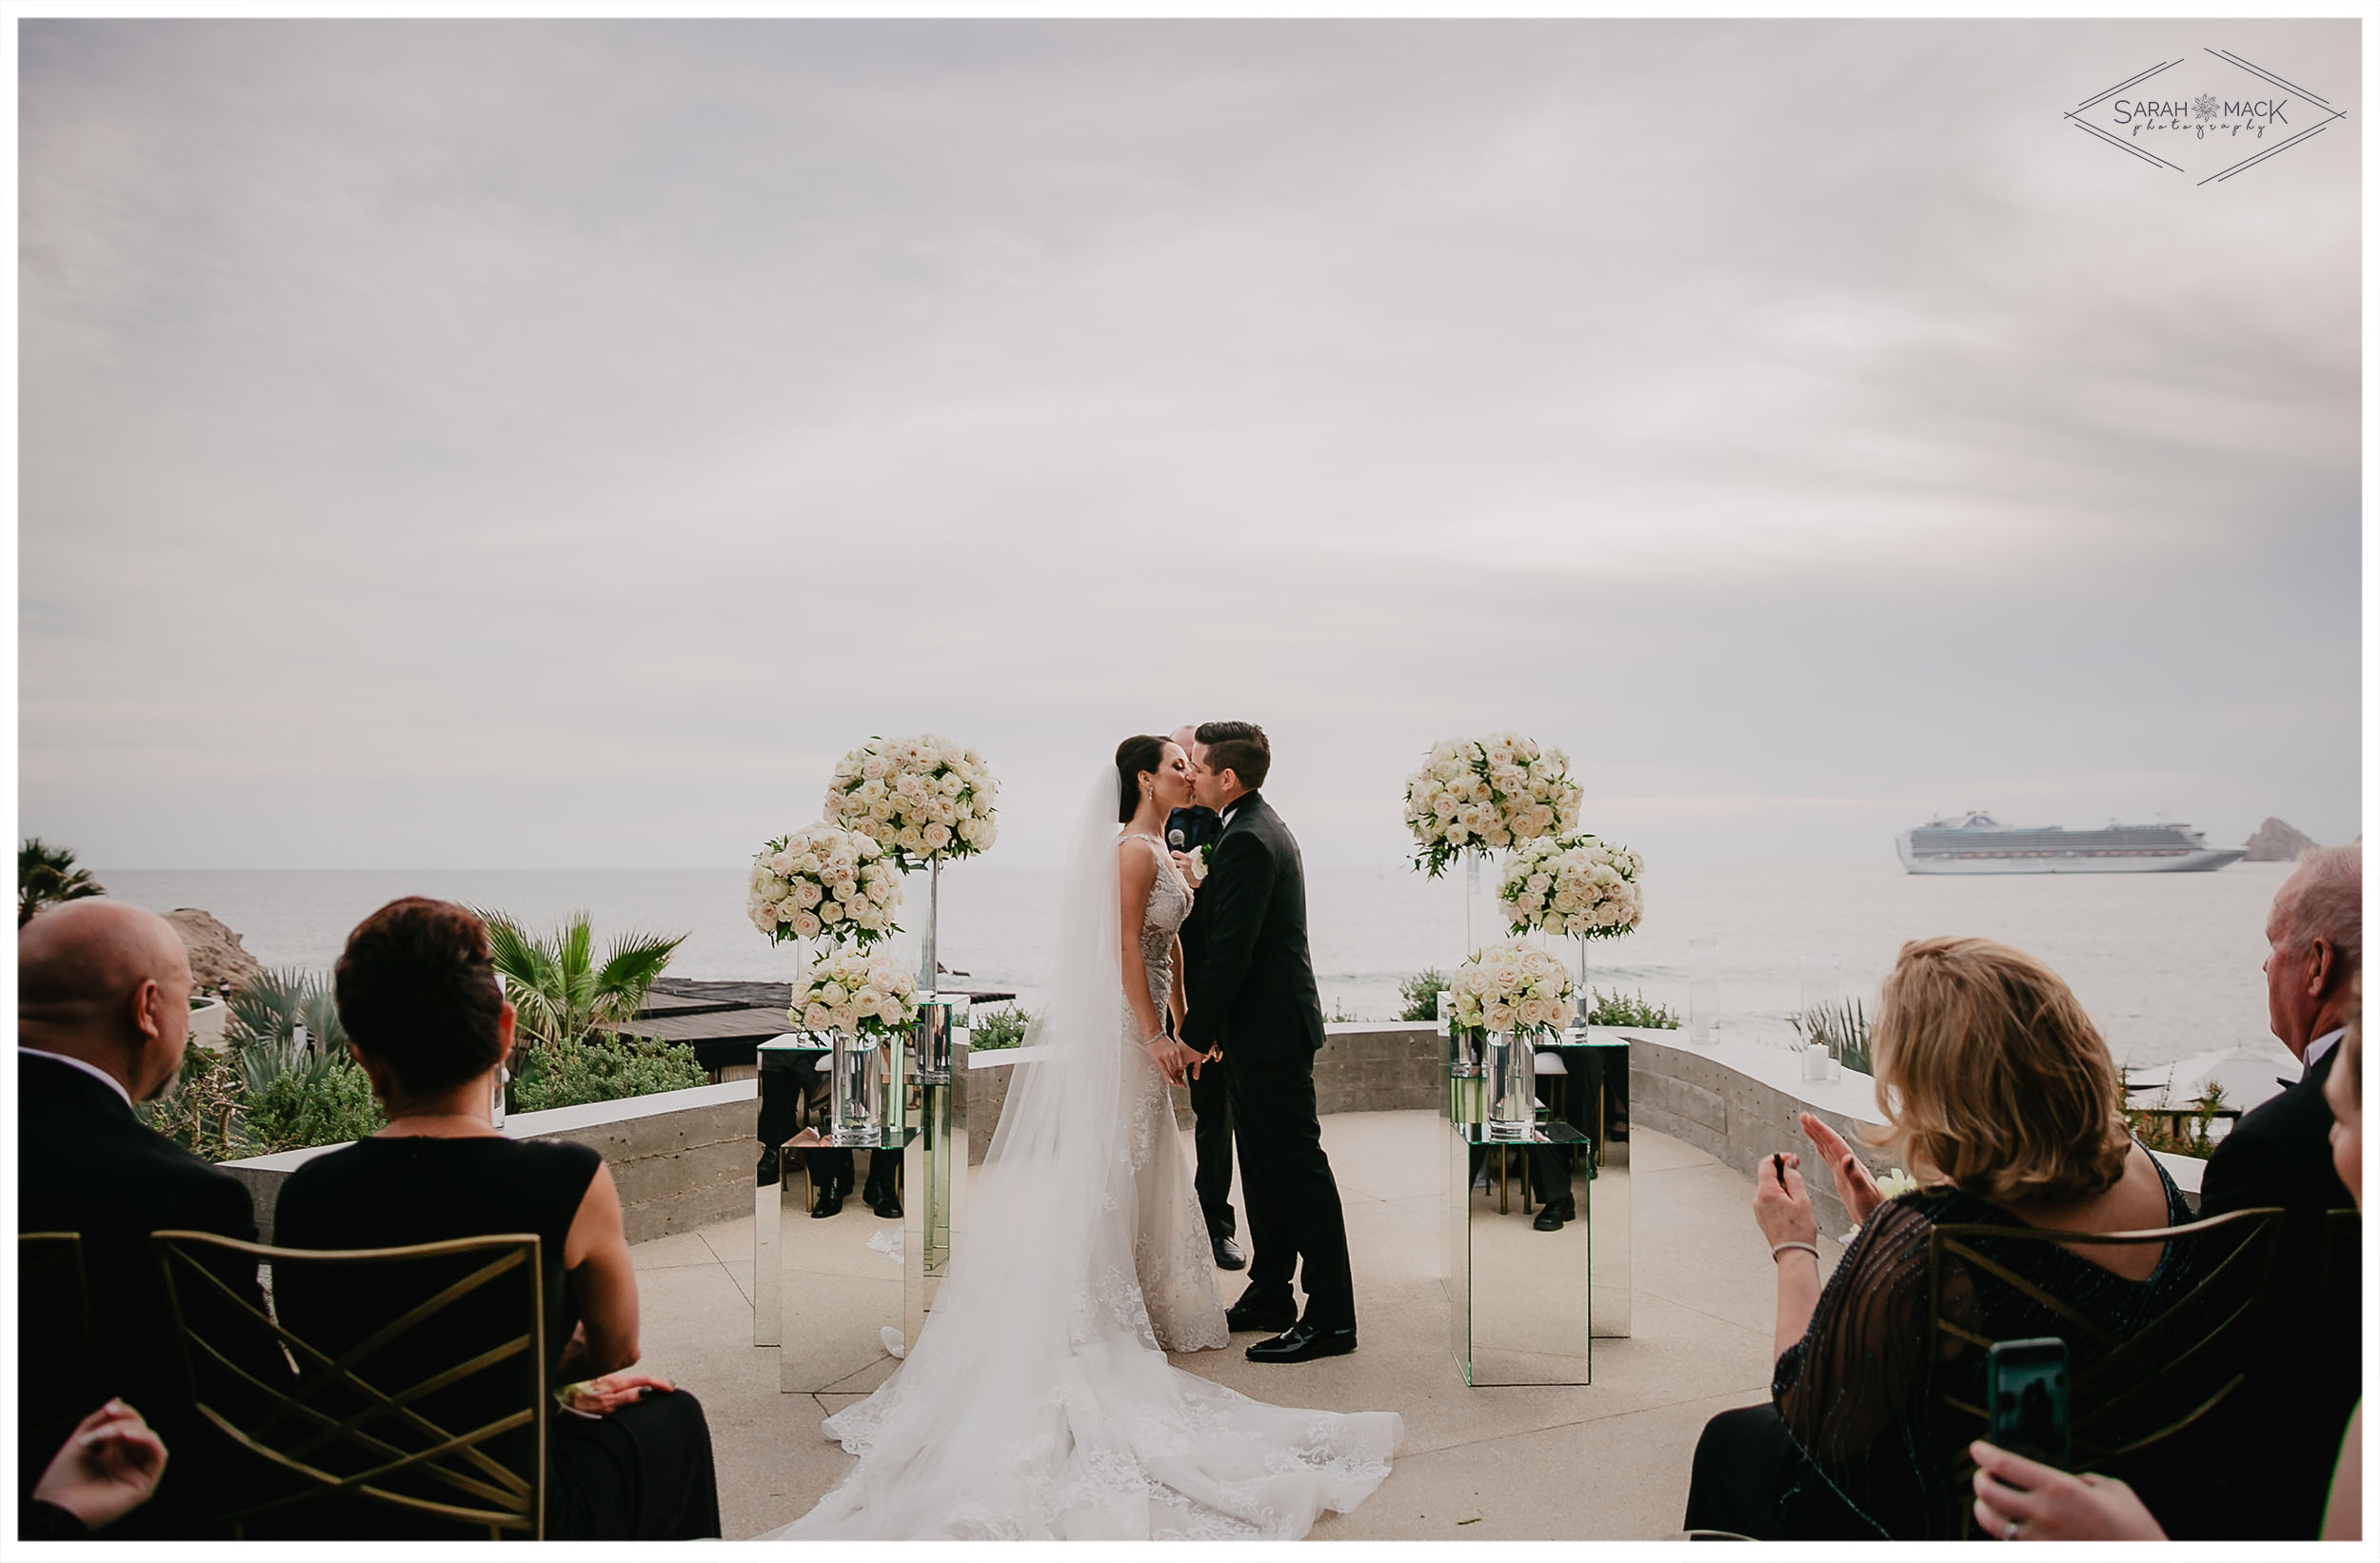 LJ-The-Cape-Hotel-Cabo-San-Lucas-Wedding-35.jpg